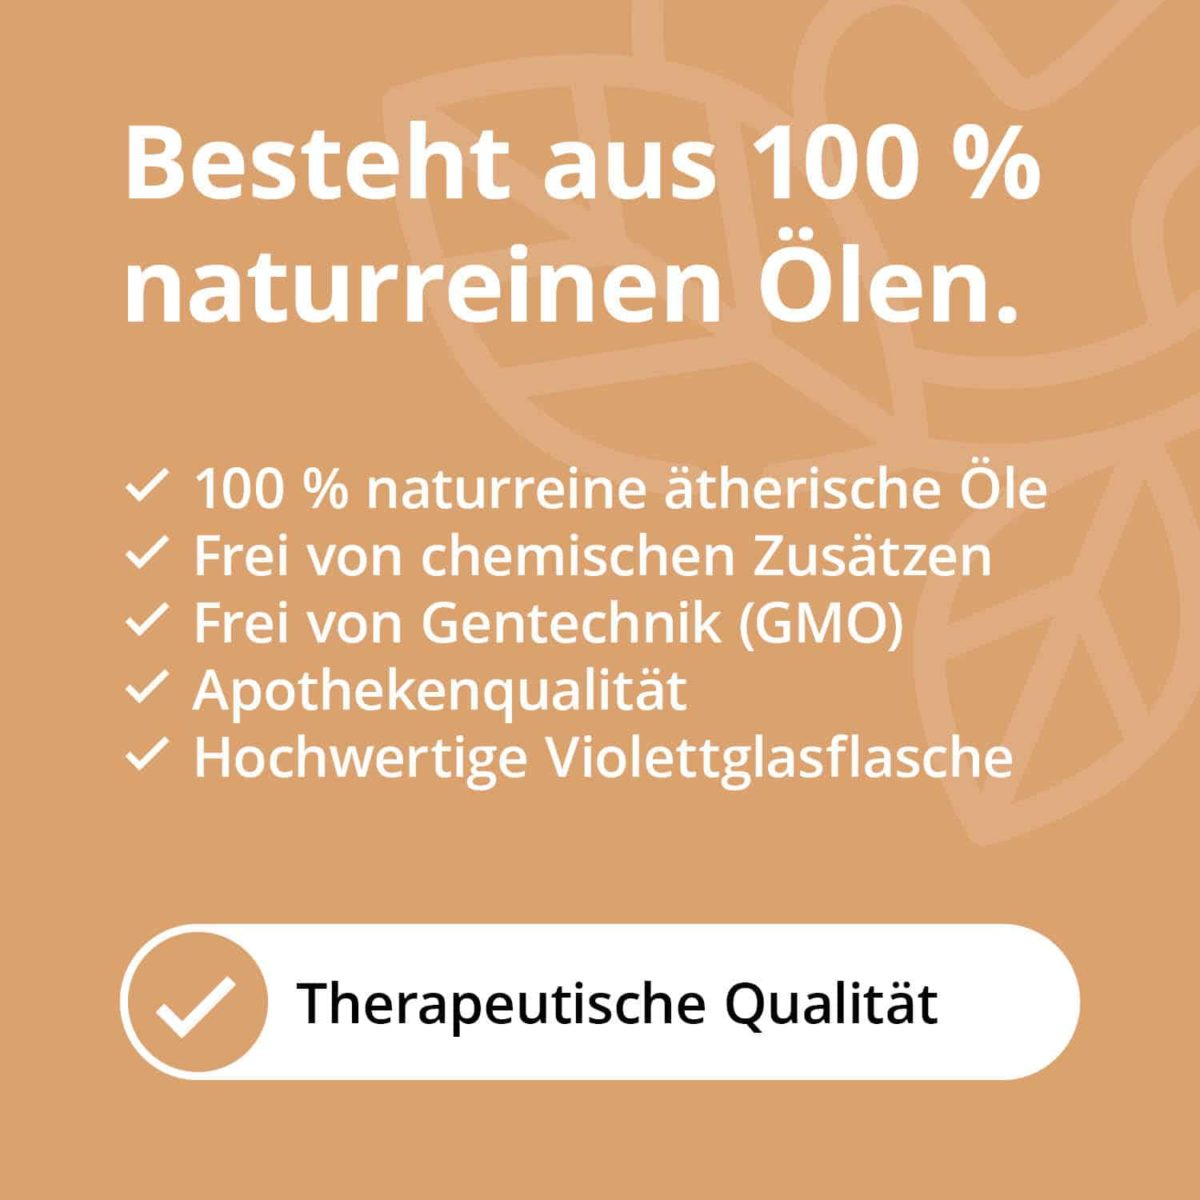 Casida Duftmischung Ruhe & Entspannung - 5 ml 17394517 PZN Apotheke Entspannung Aromatherapie Aromapflege Aromaschmuck Diffuser5